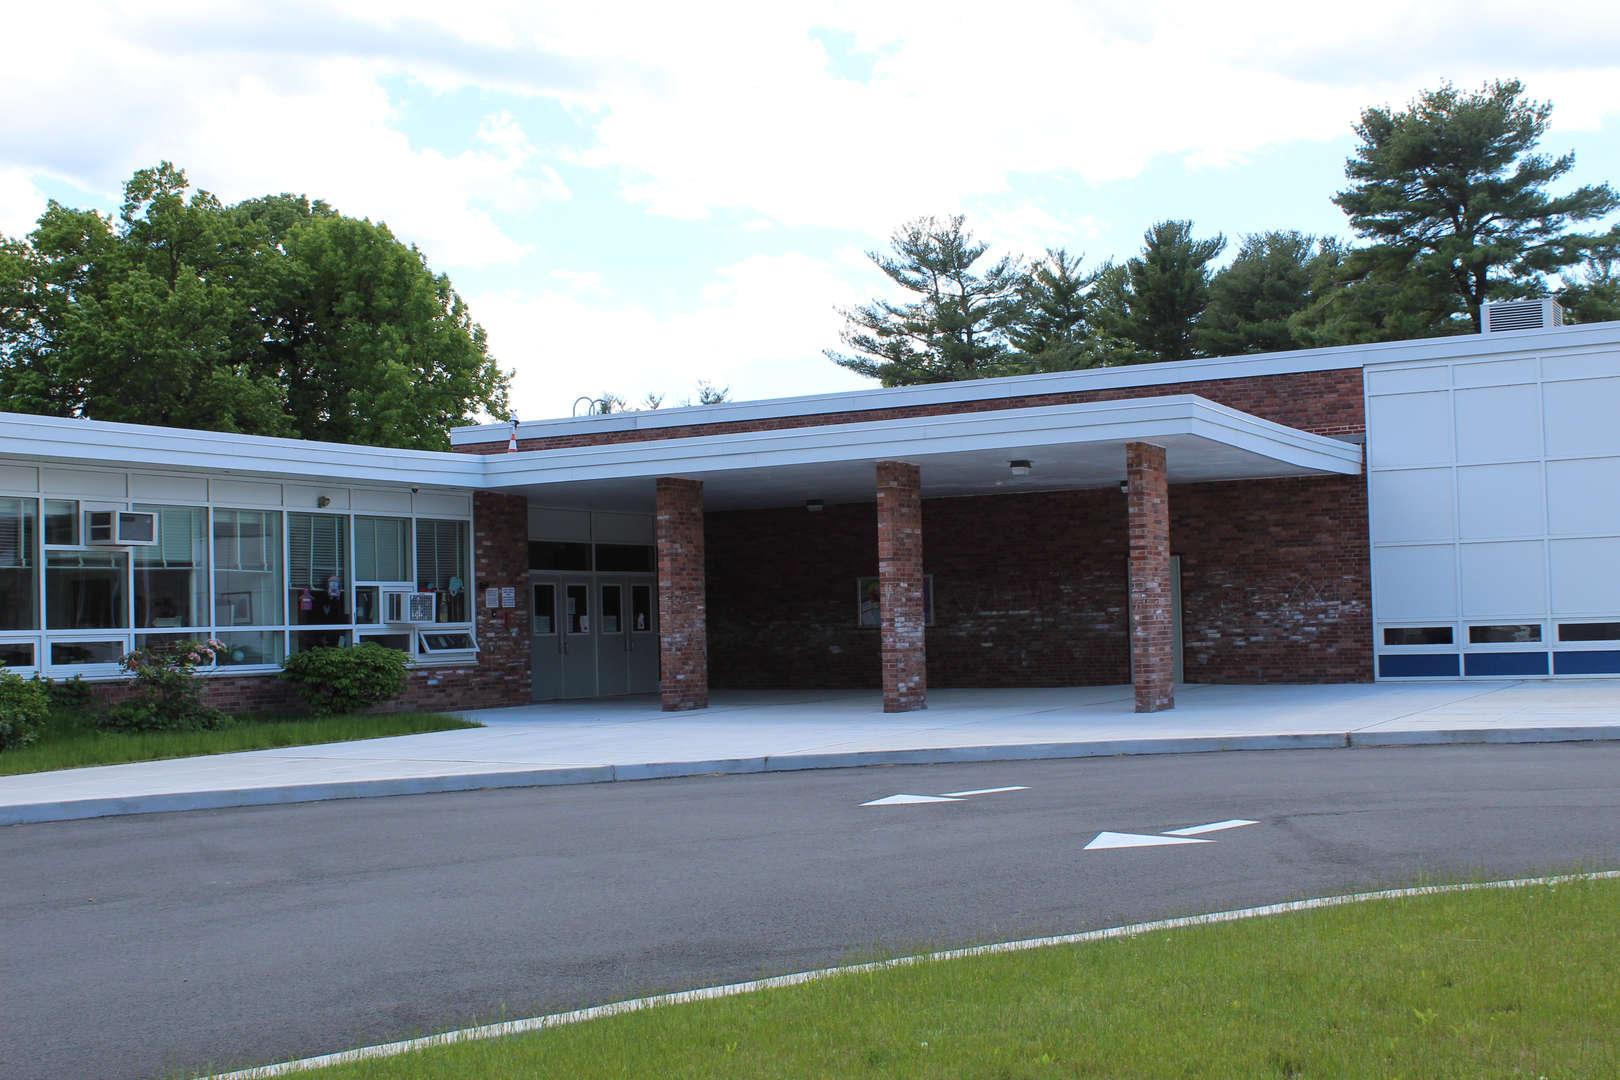 Outside of King Street Elementary School building